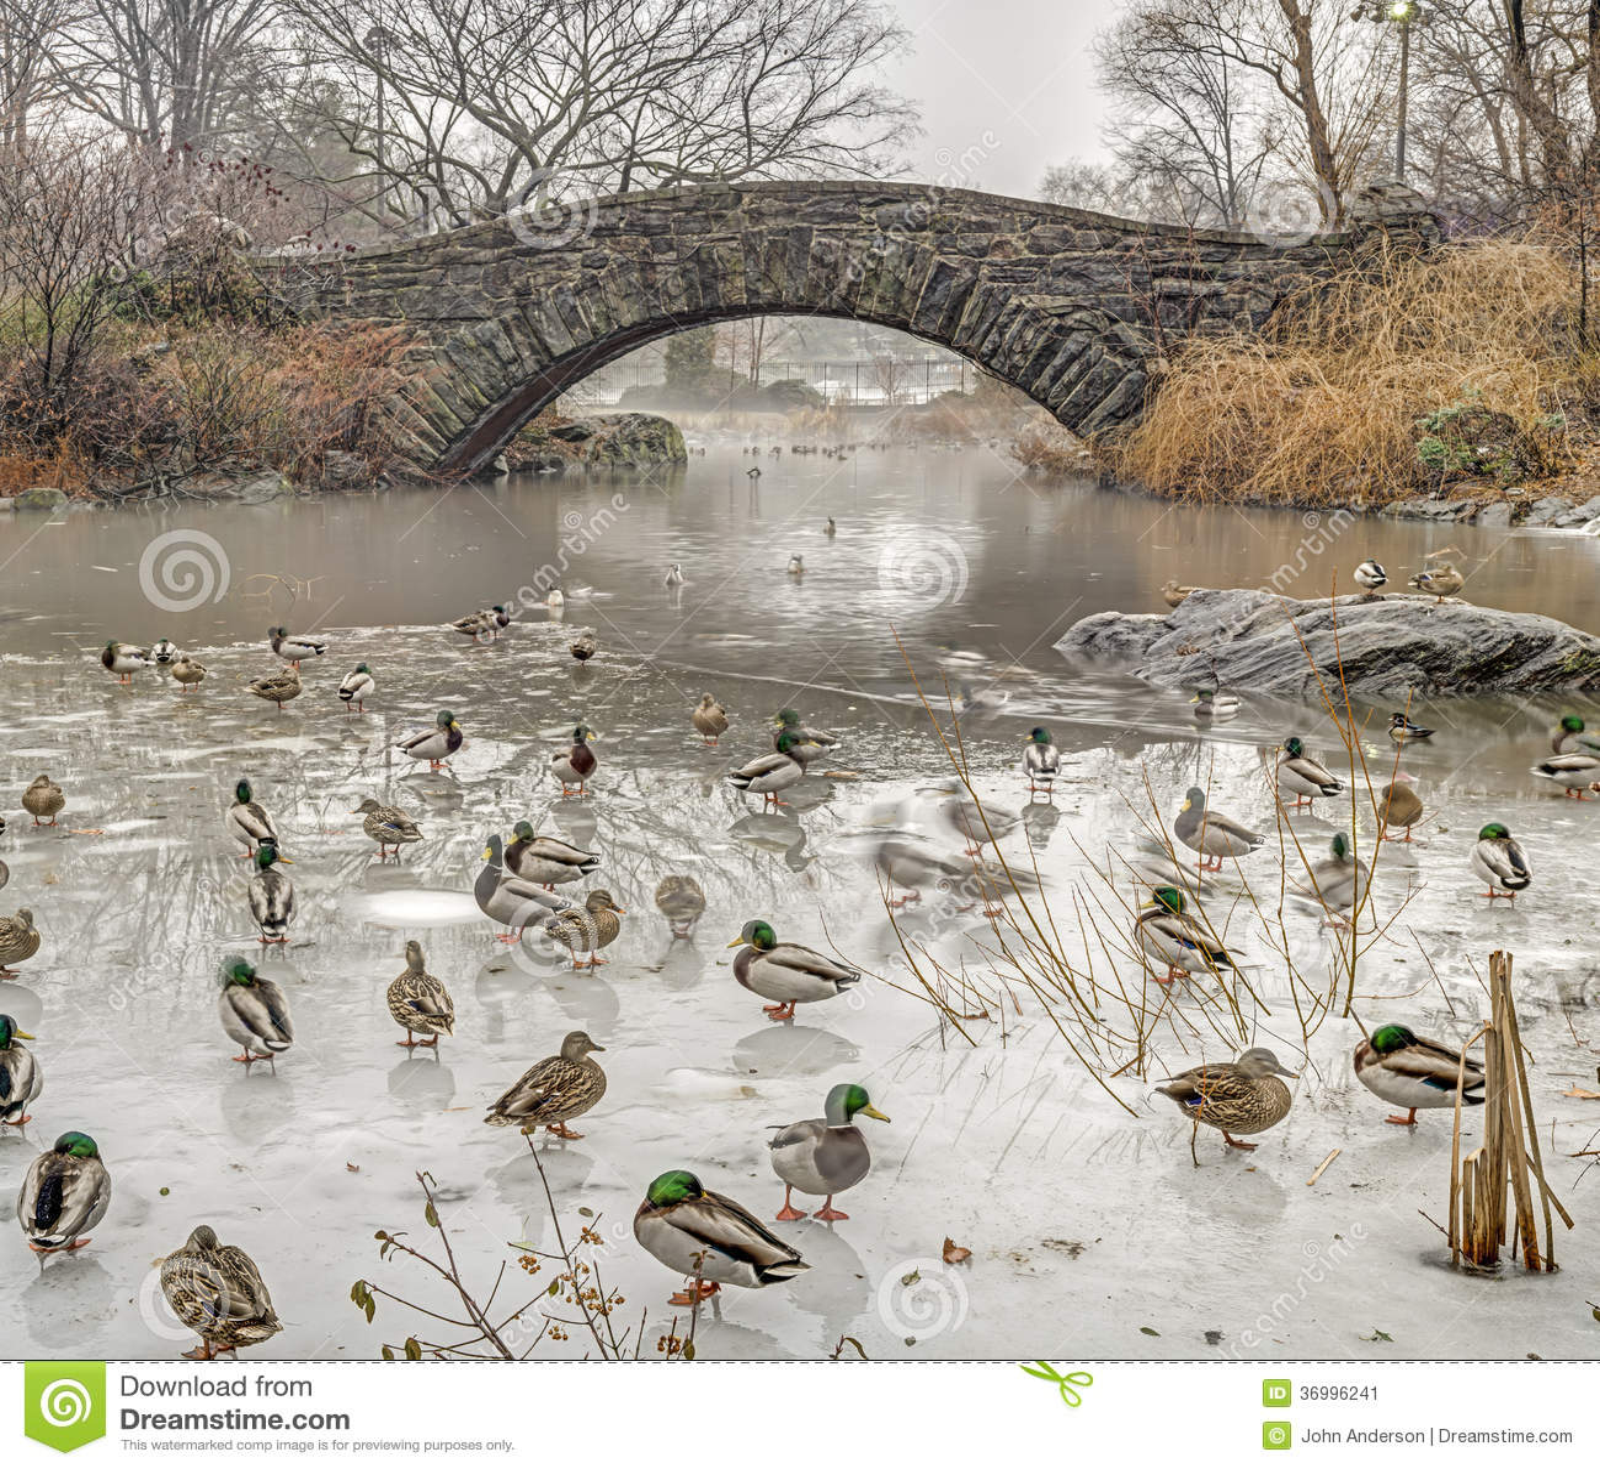 gapstow bridge central park  new york city stock image Cartoon Pond of Water Ducks in a Row Clip Art